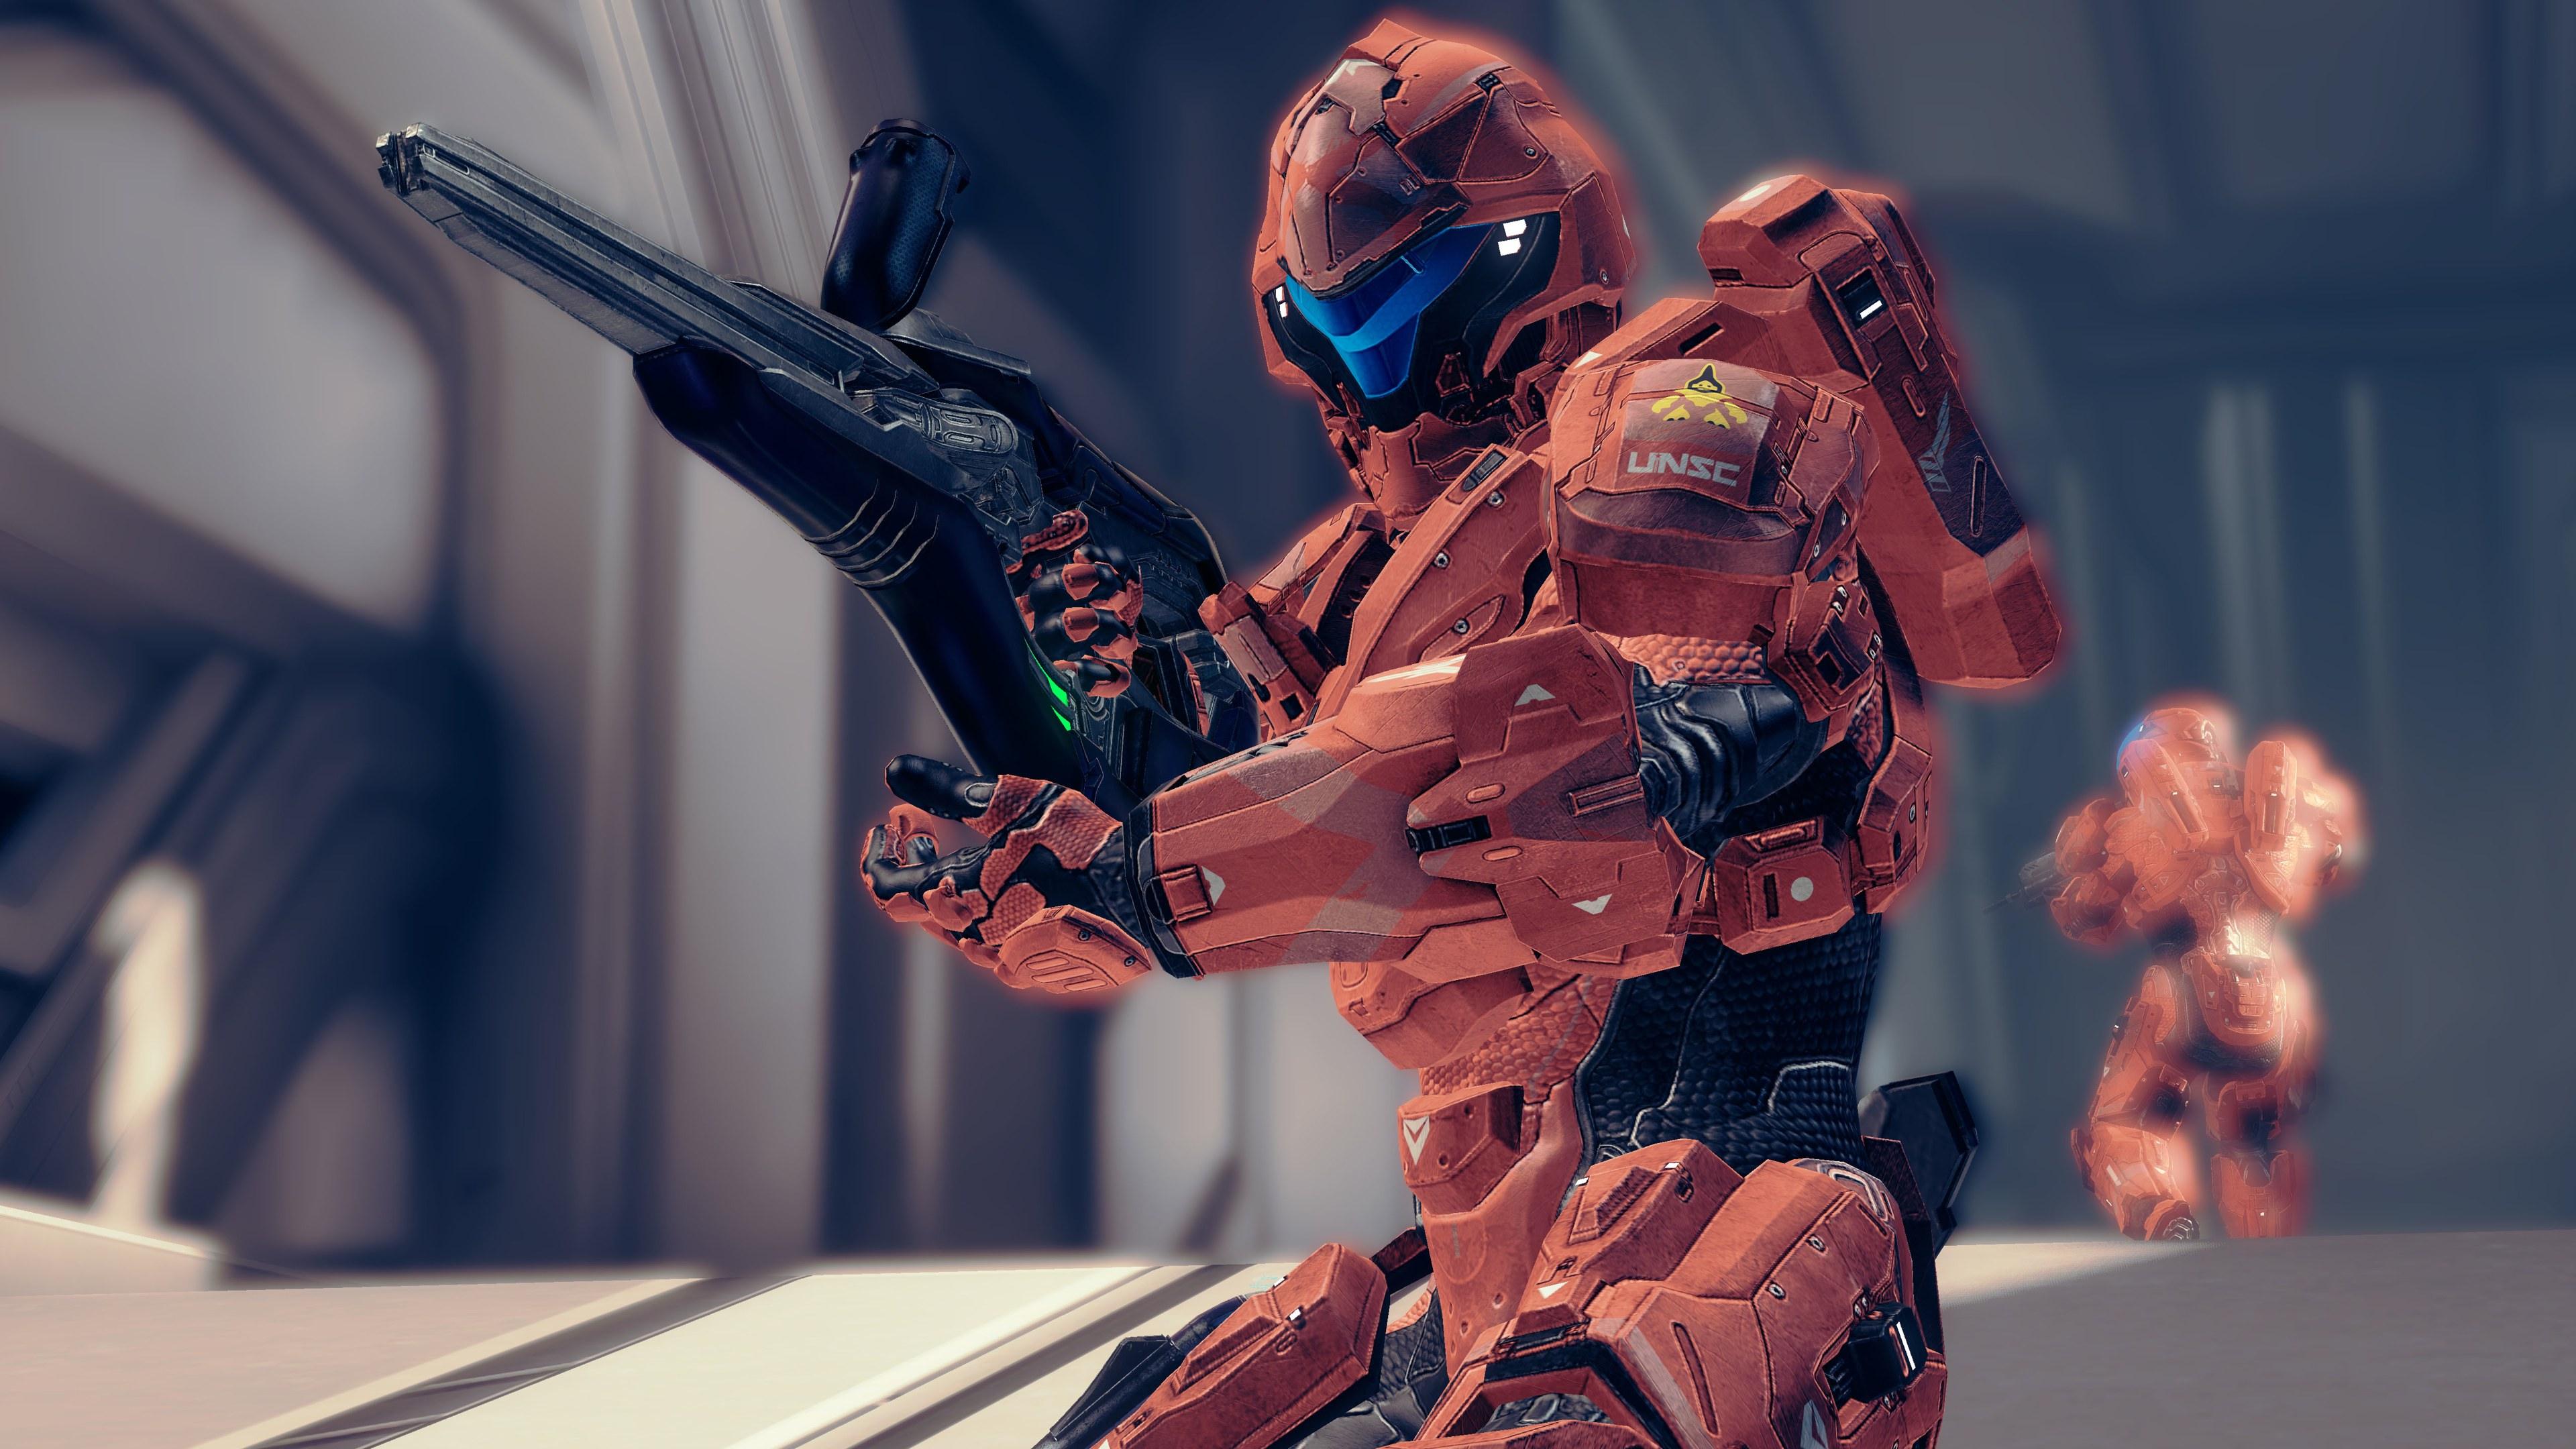 Halo4 360 Editeur 270